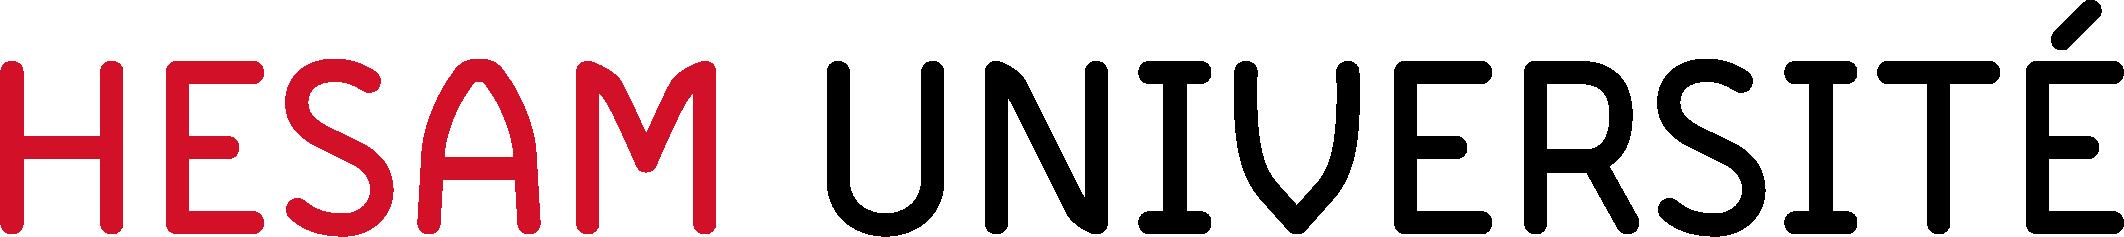 Logo hesam